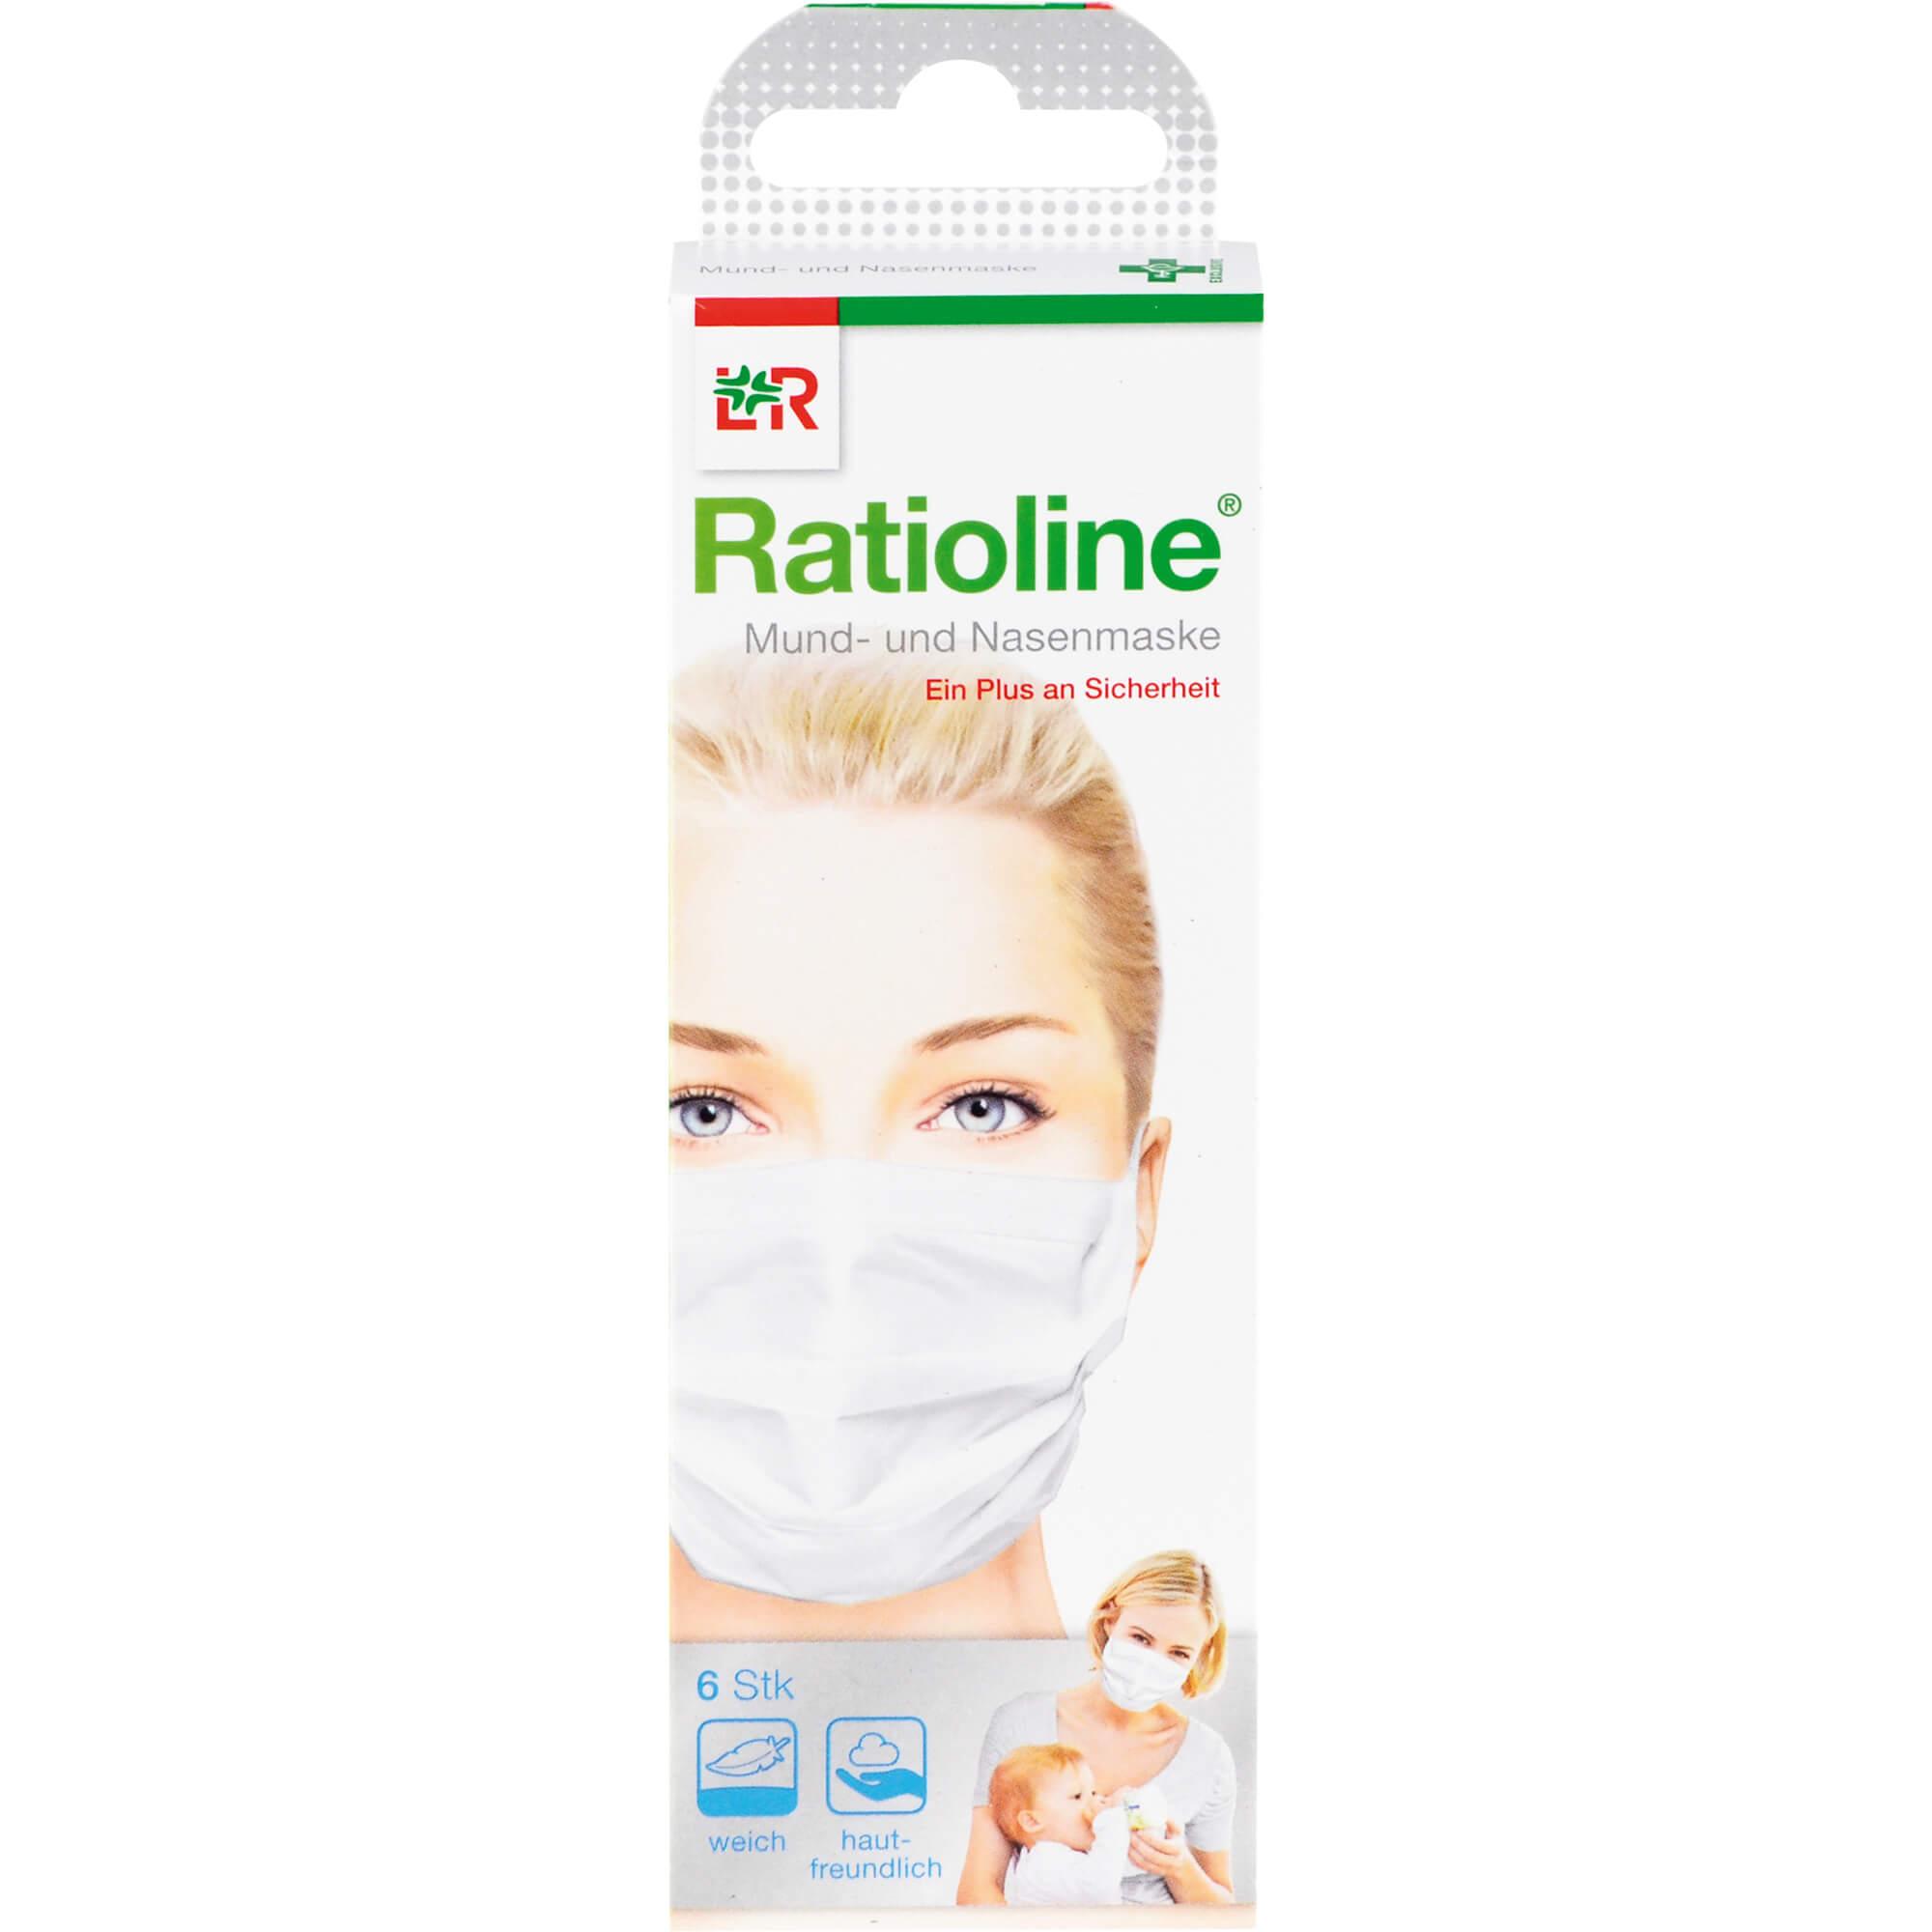 RATIOLINE-bambino-Mund-und-Nasenmaske